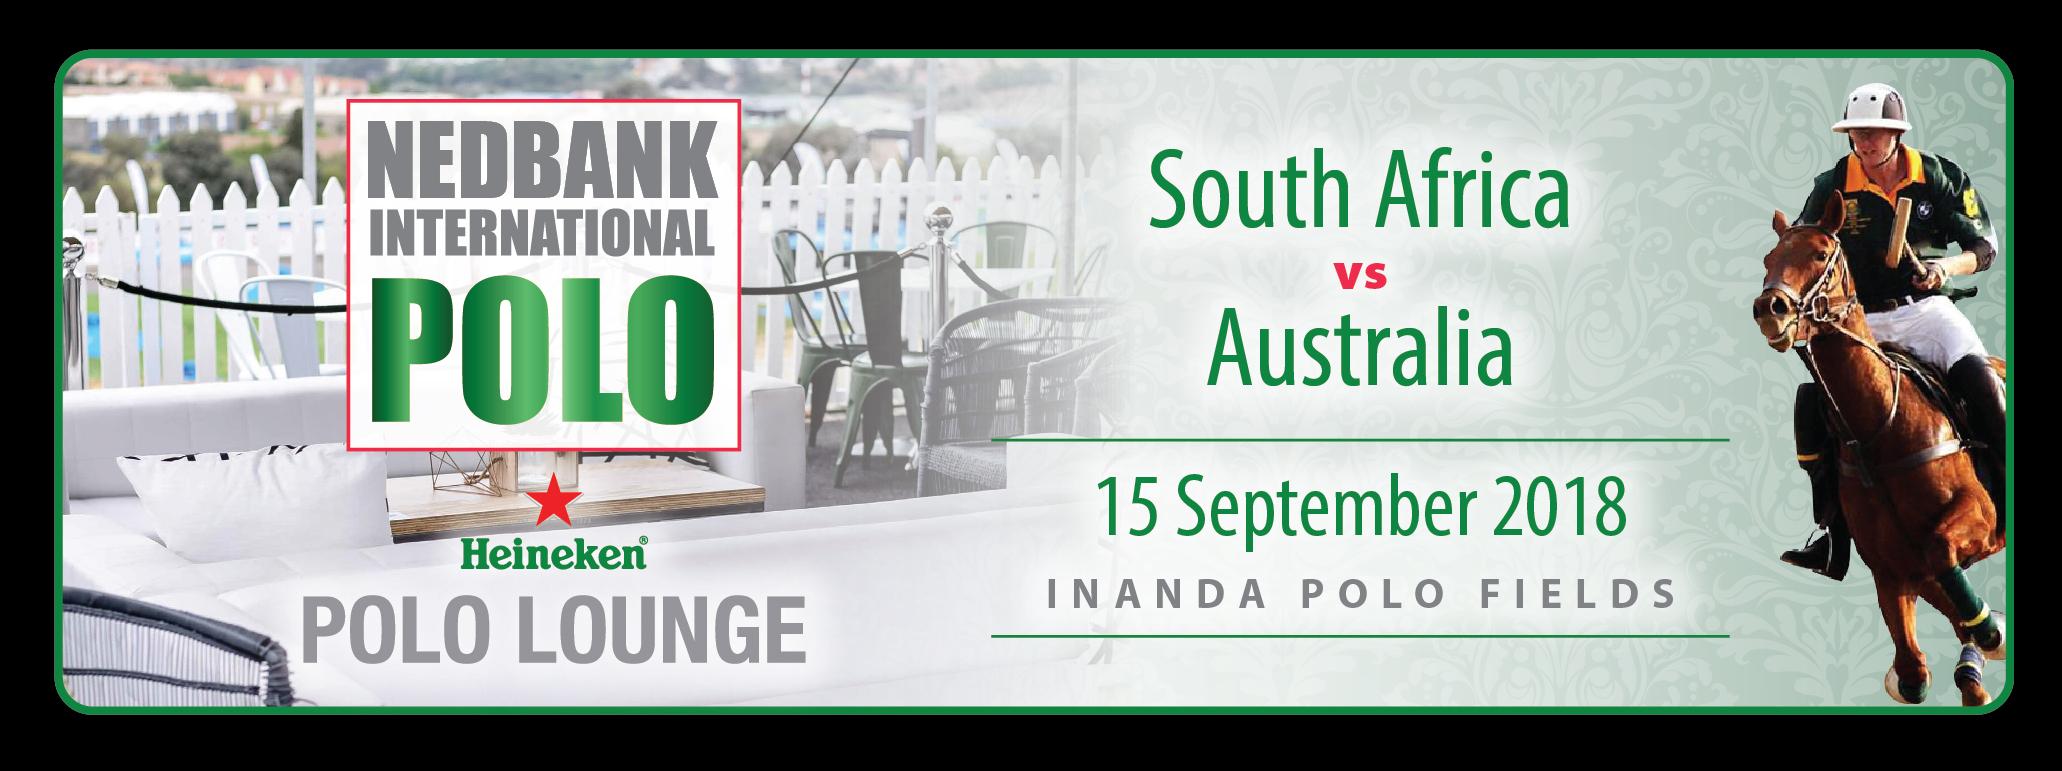 Nedbank International Polo - Inanda Fields - South Africa vs Australia